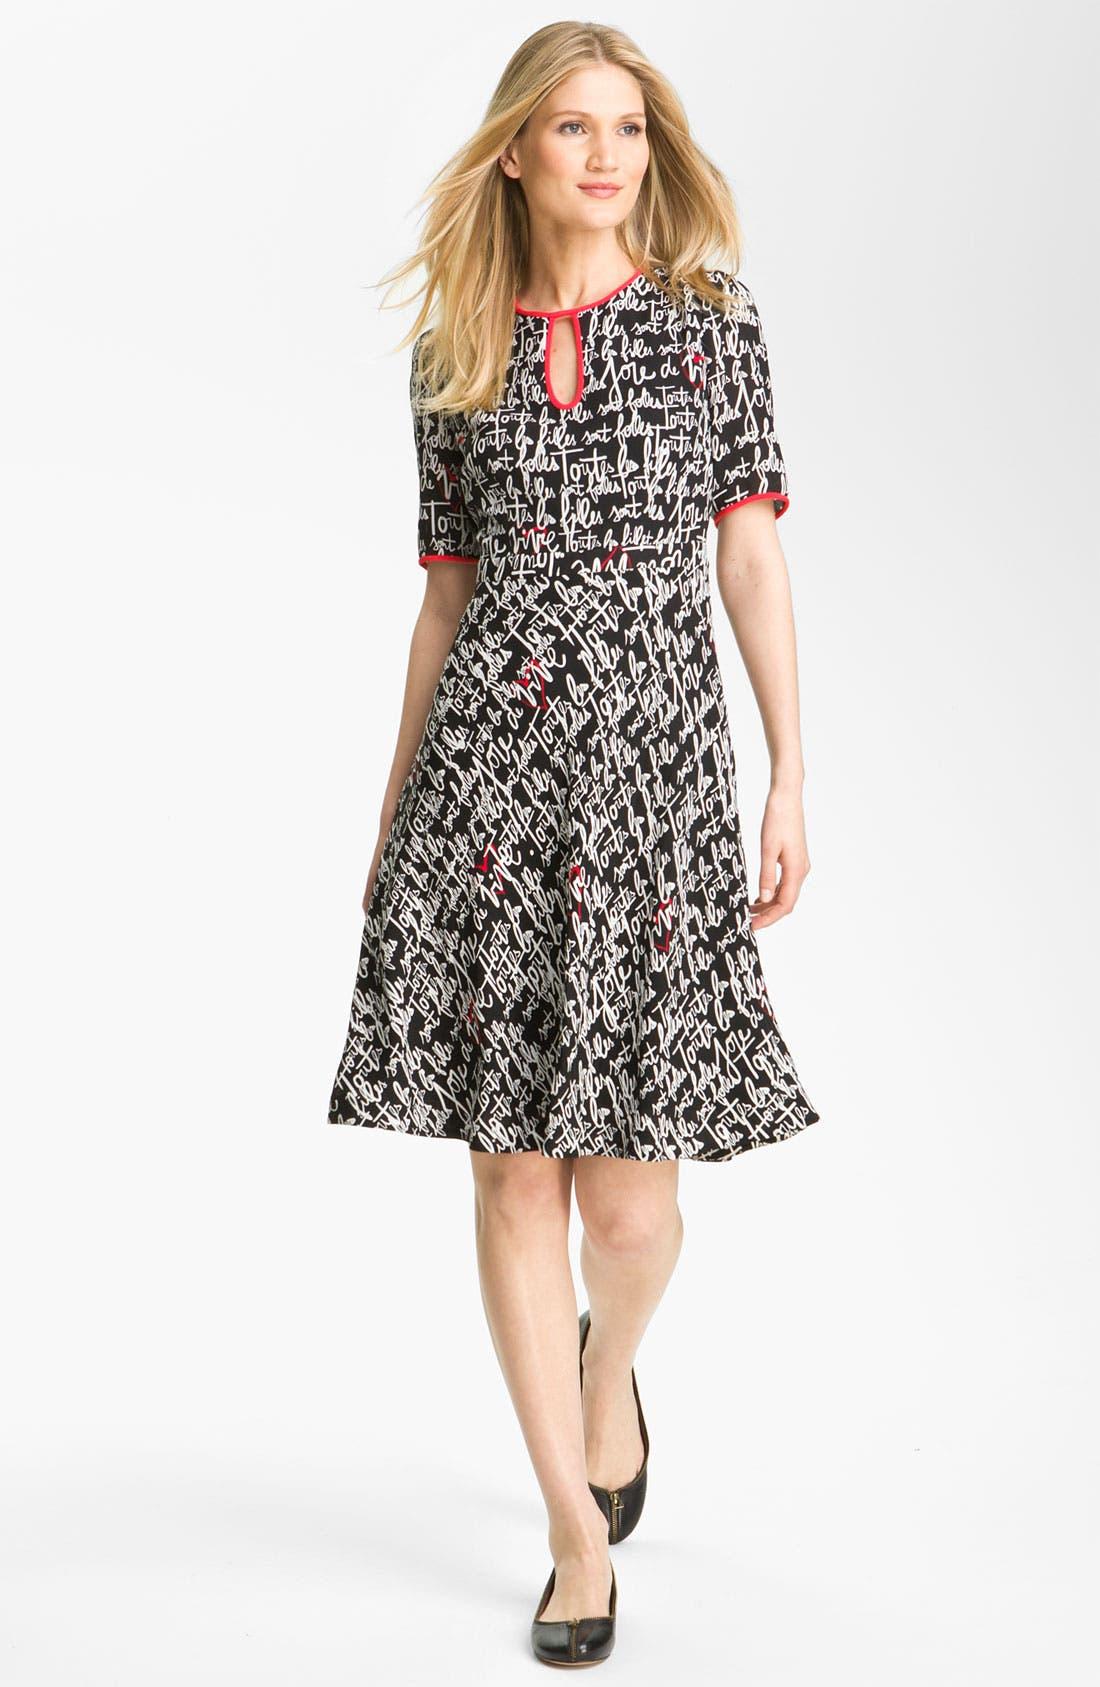 Main Image - kate spade new york dress & accessories